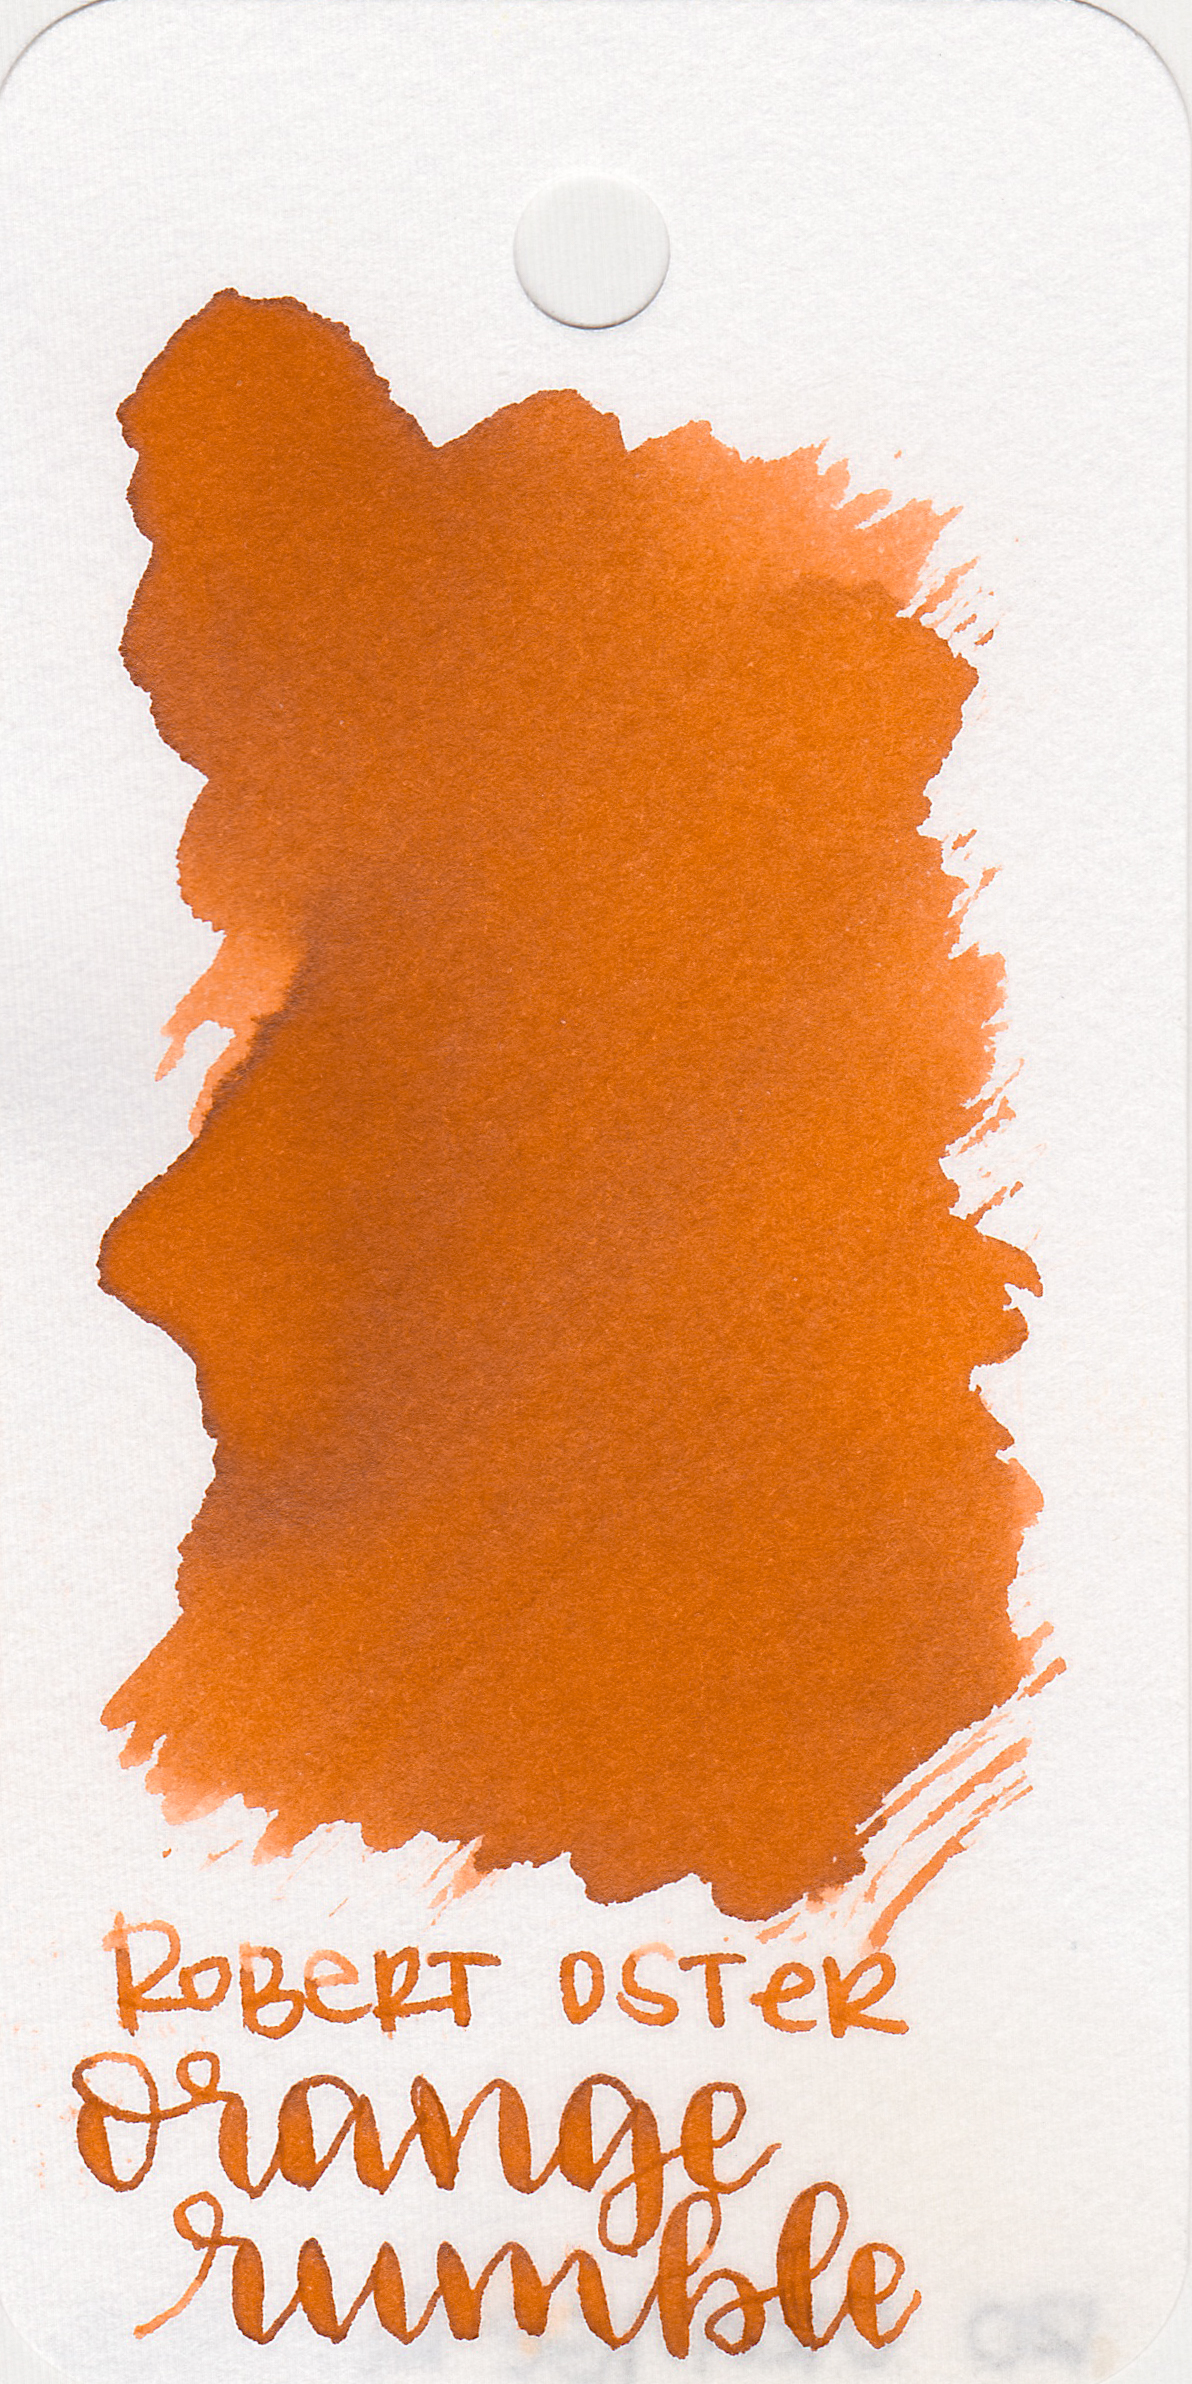 The color: - Orange Rumble is a dark 70's orange.